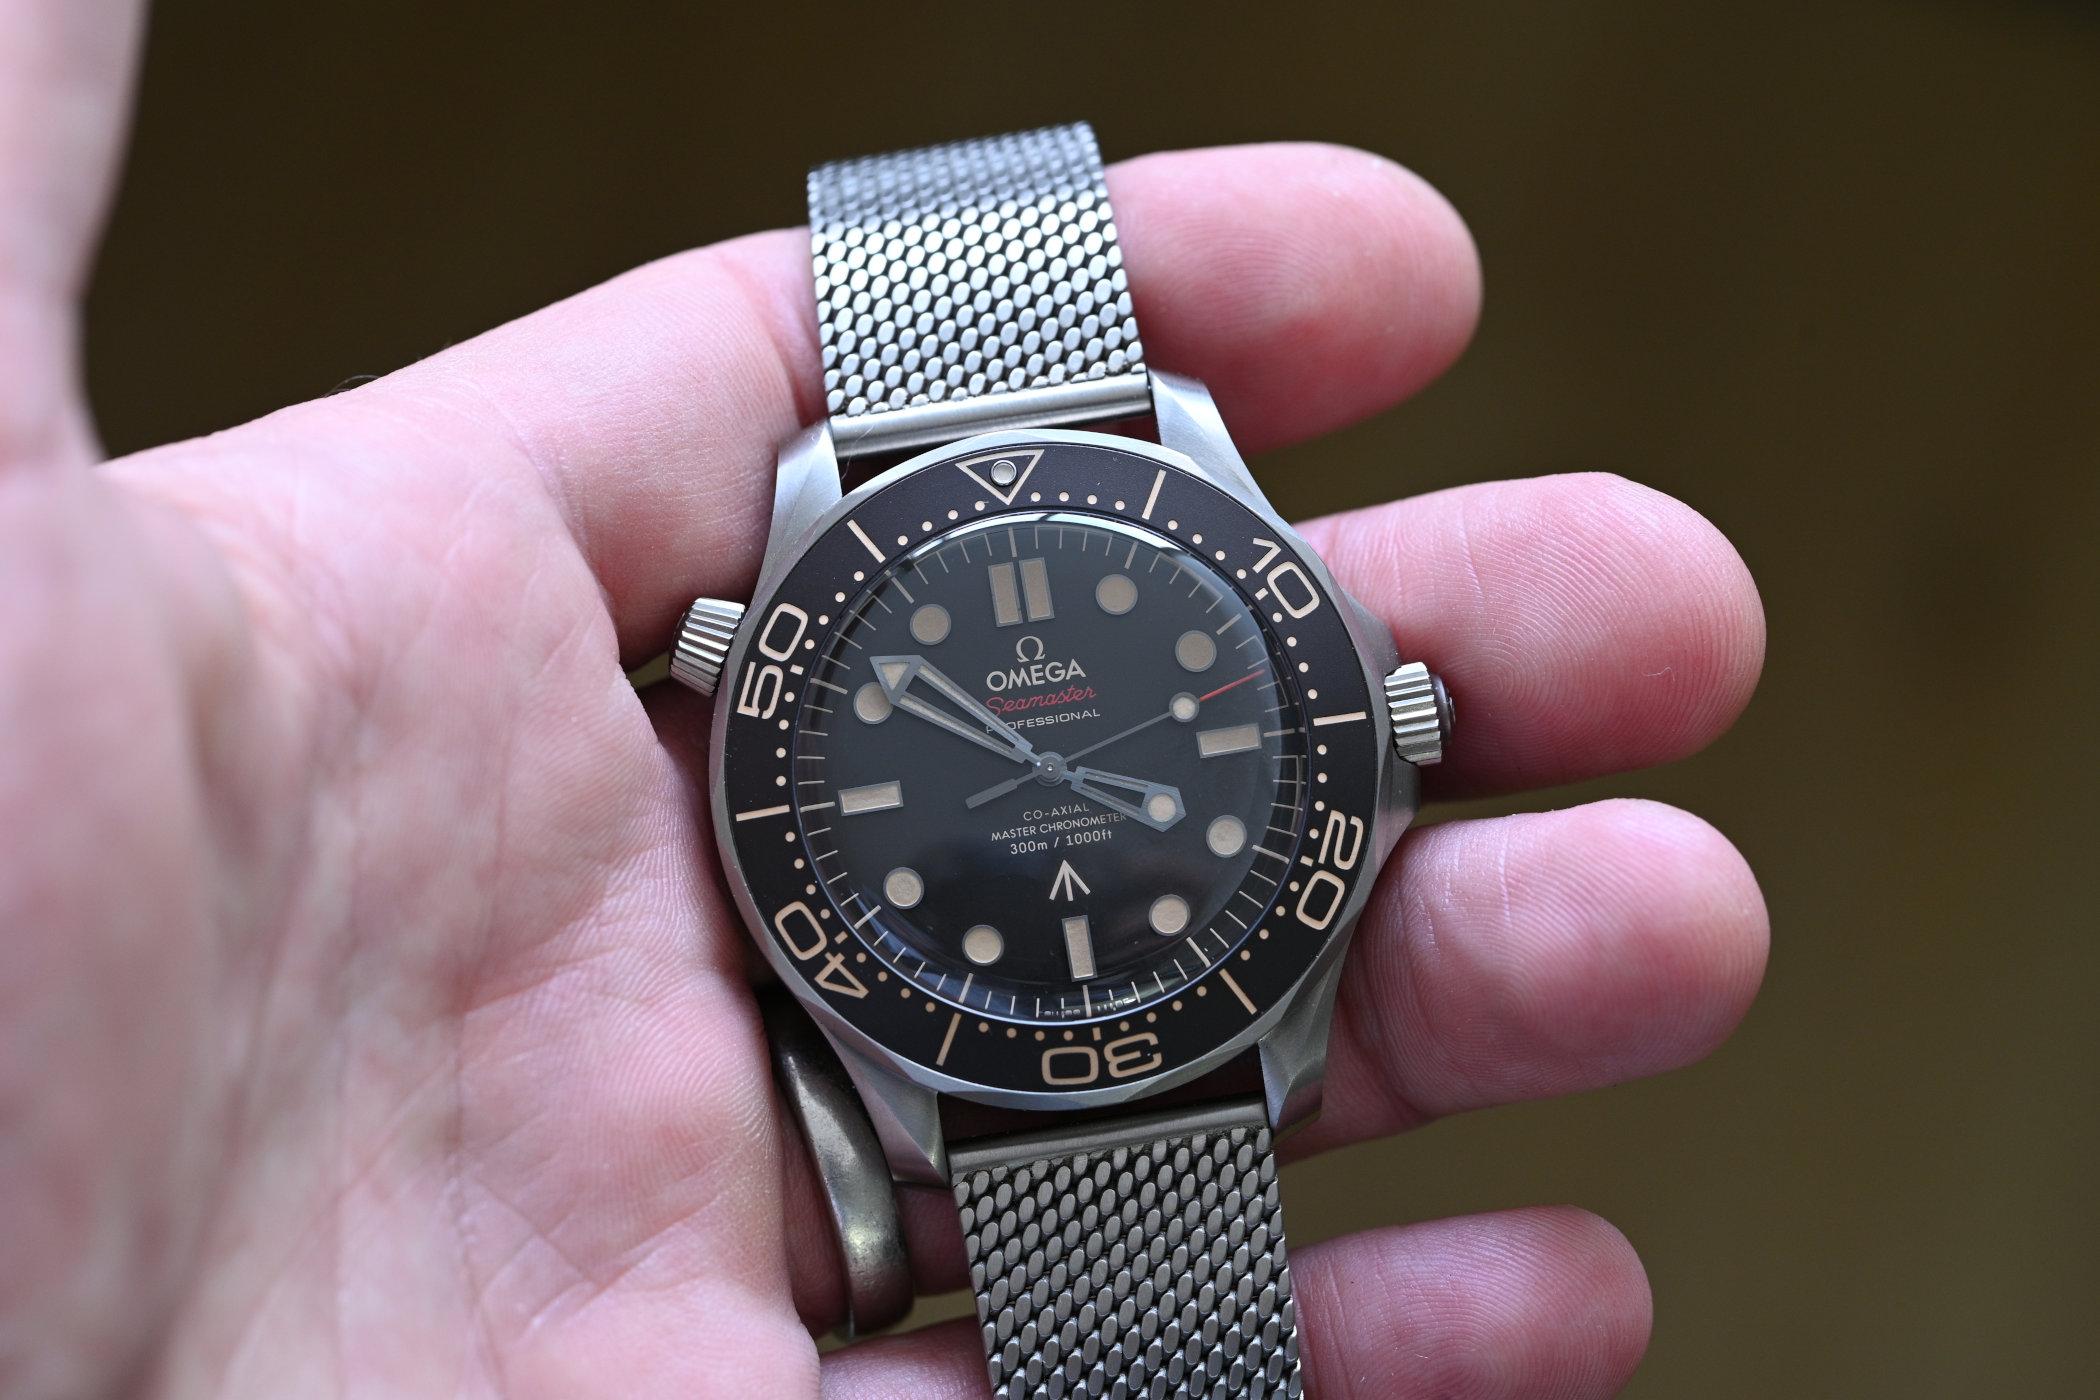 Omega Seamaster Diver 300M 007 Edition 11